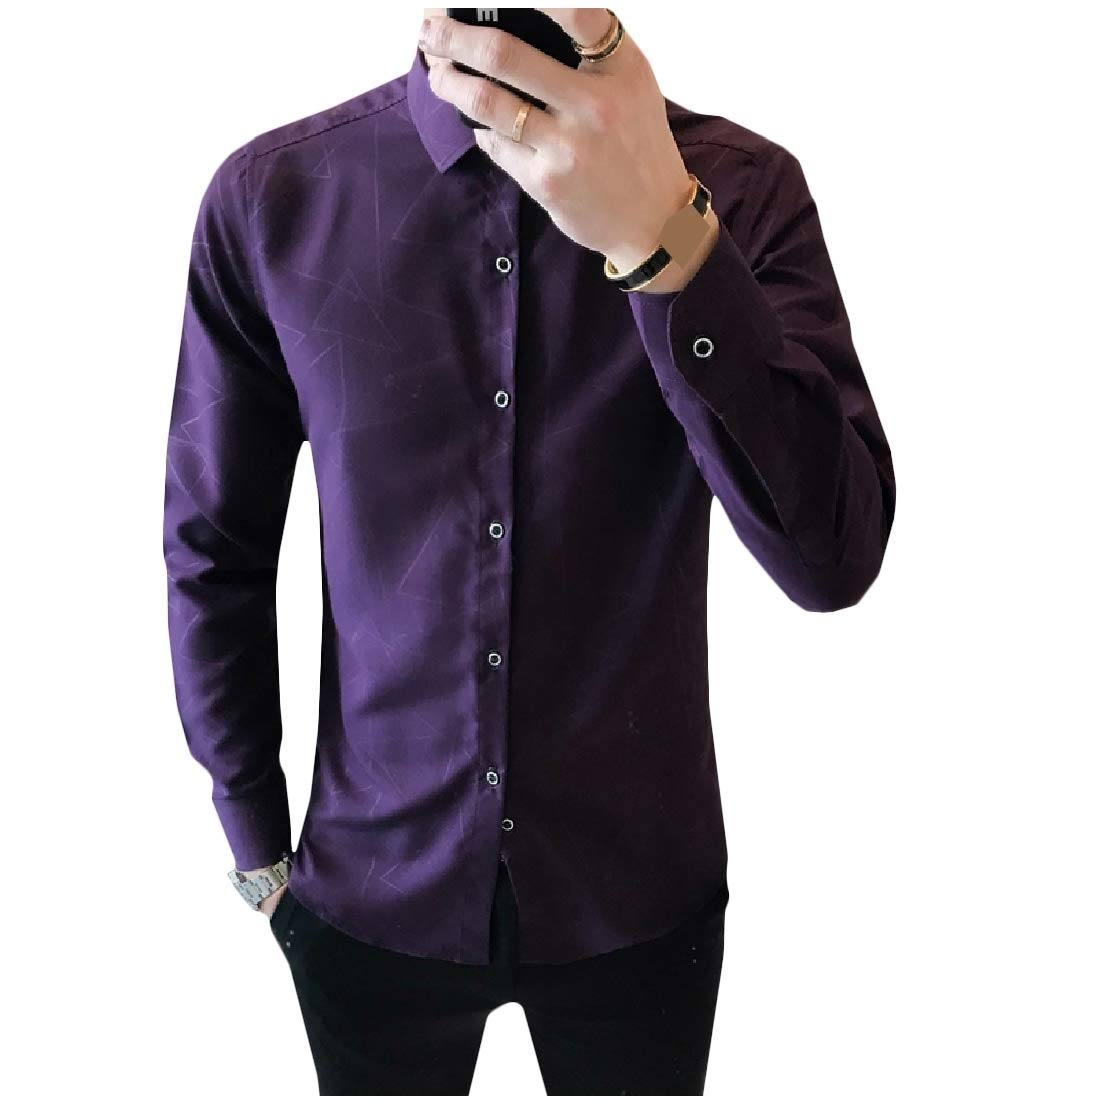 Vska Men Britain Square Collor Geometric Printing Long Sleeve Button Down Shirt